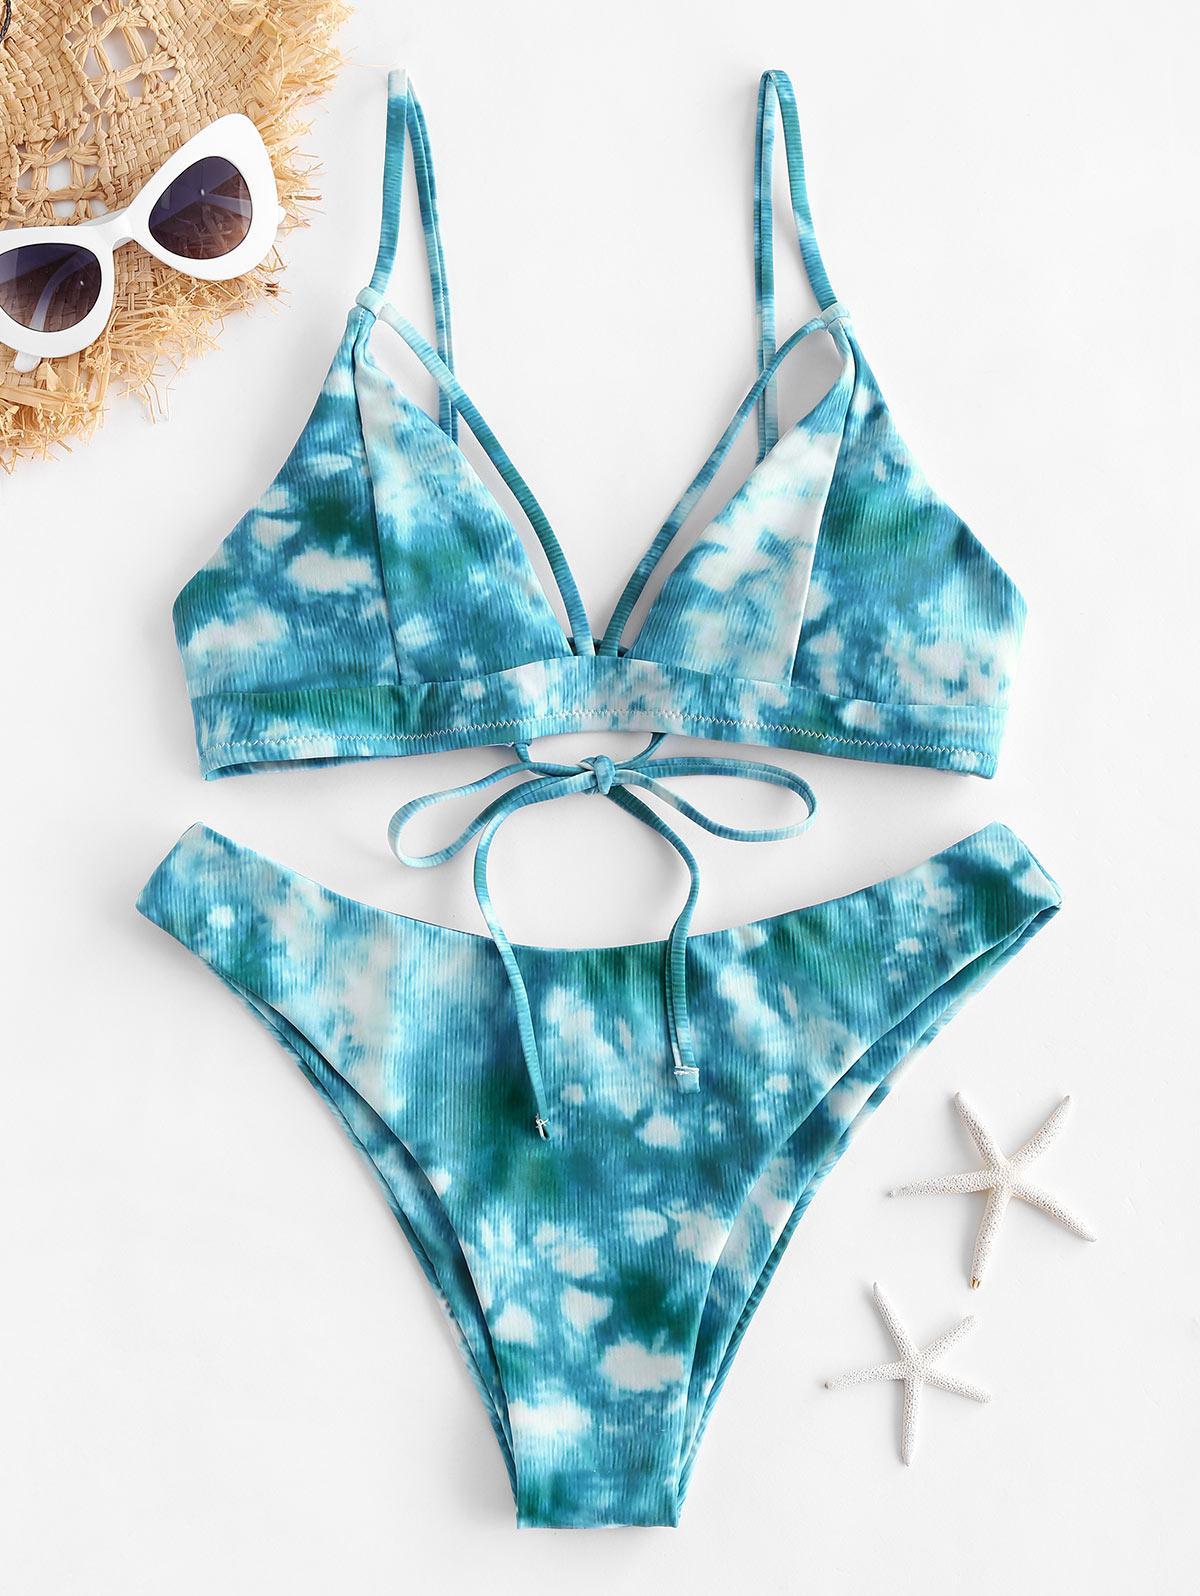 ZAFUL Tie Dye Strappy Bikini Swimsuit thumbnail